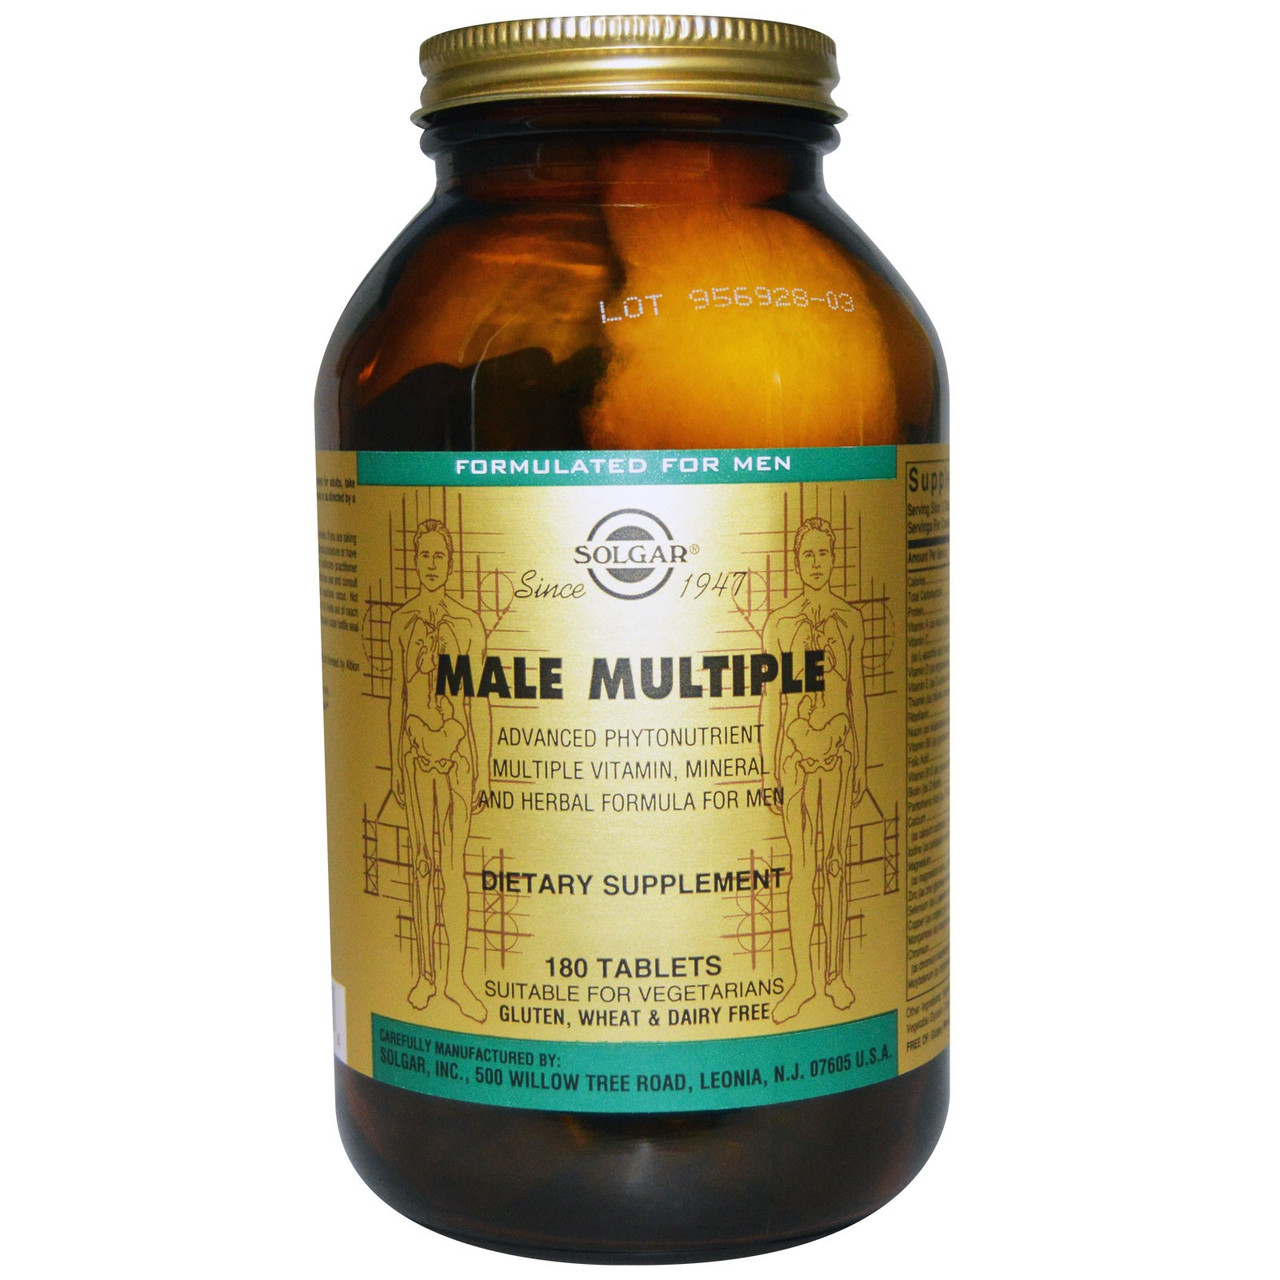 Мультивитамины для мужчин Солгар Male Multiple 180 таблеток. Сделано в США.